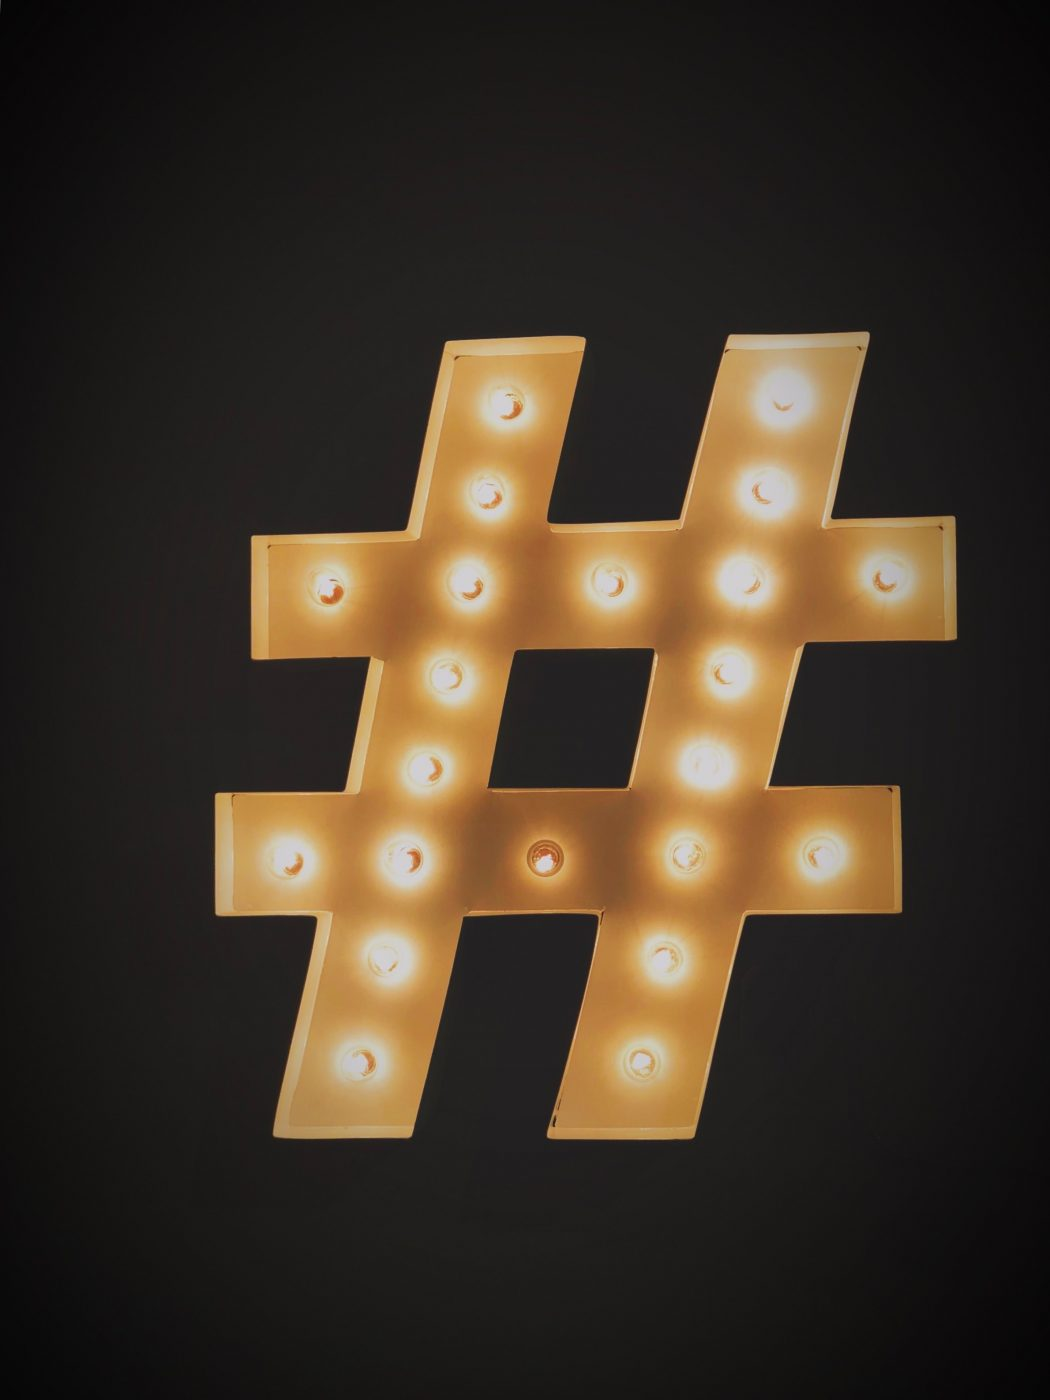 hashtags in social media marketing